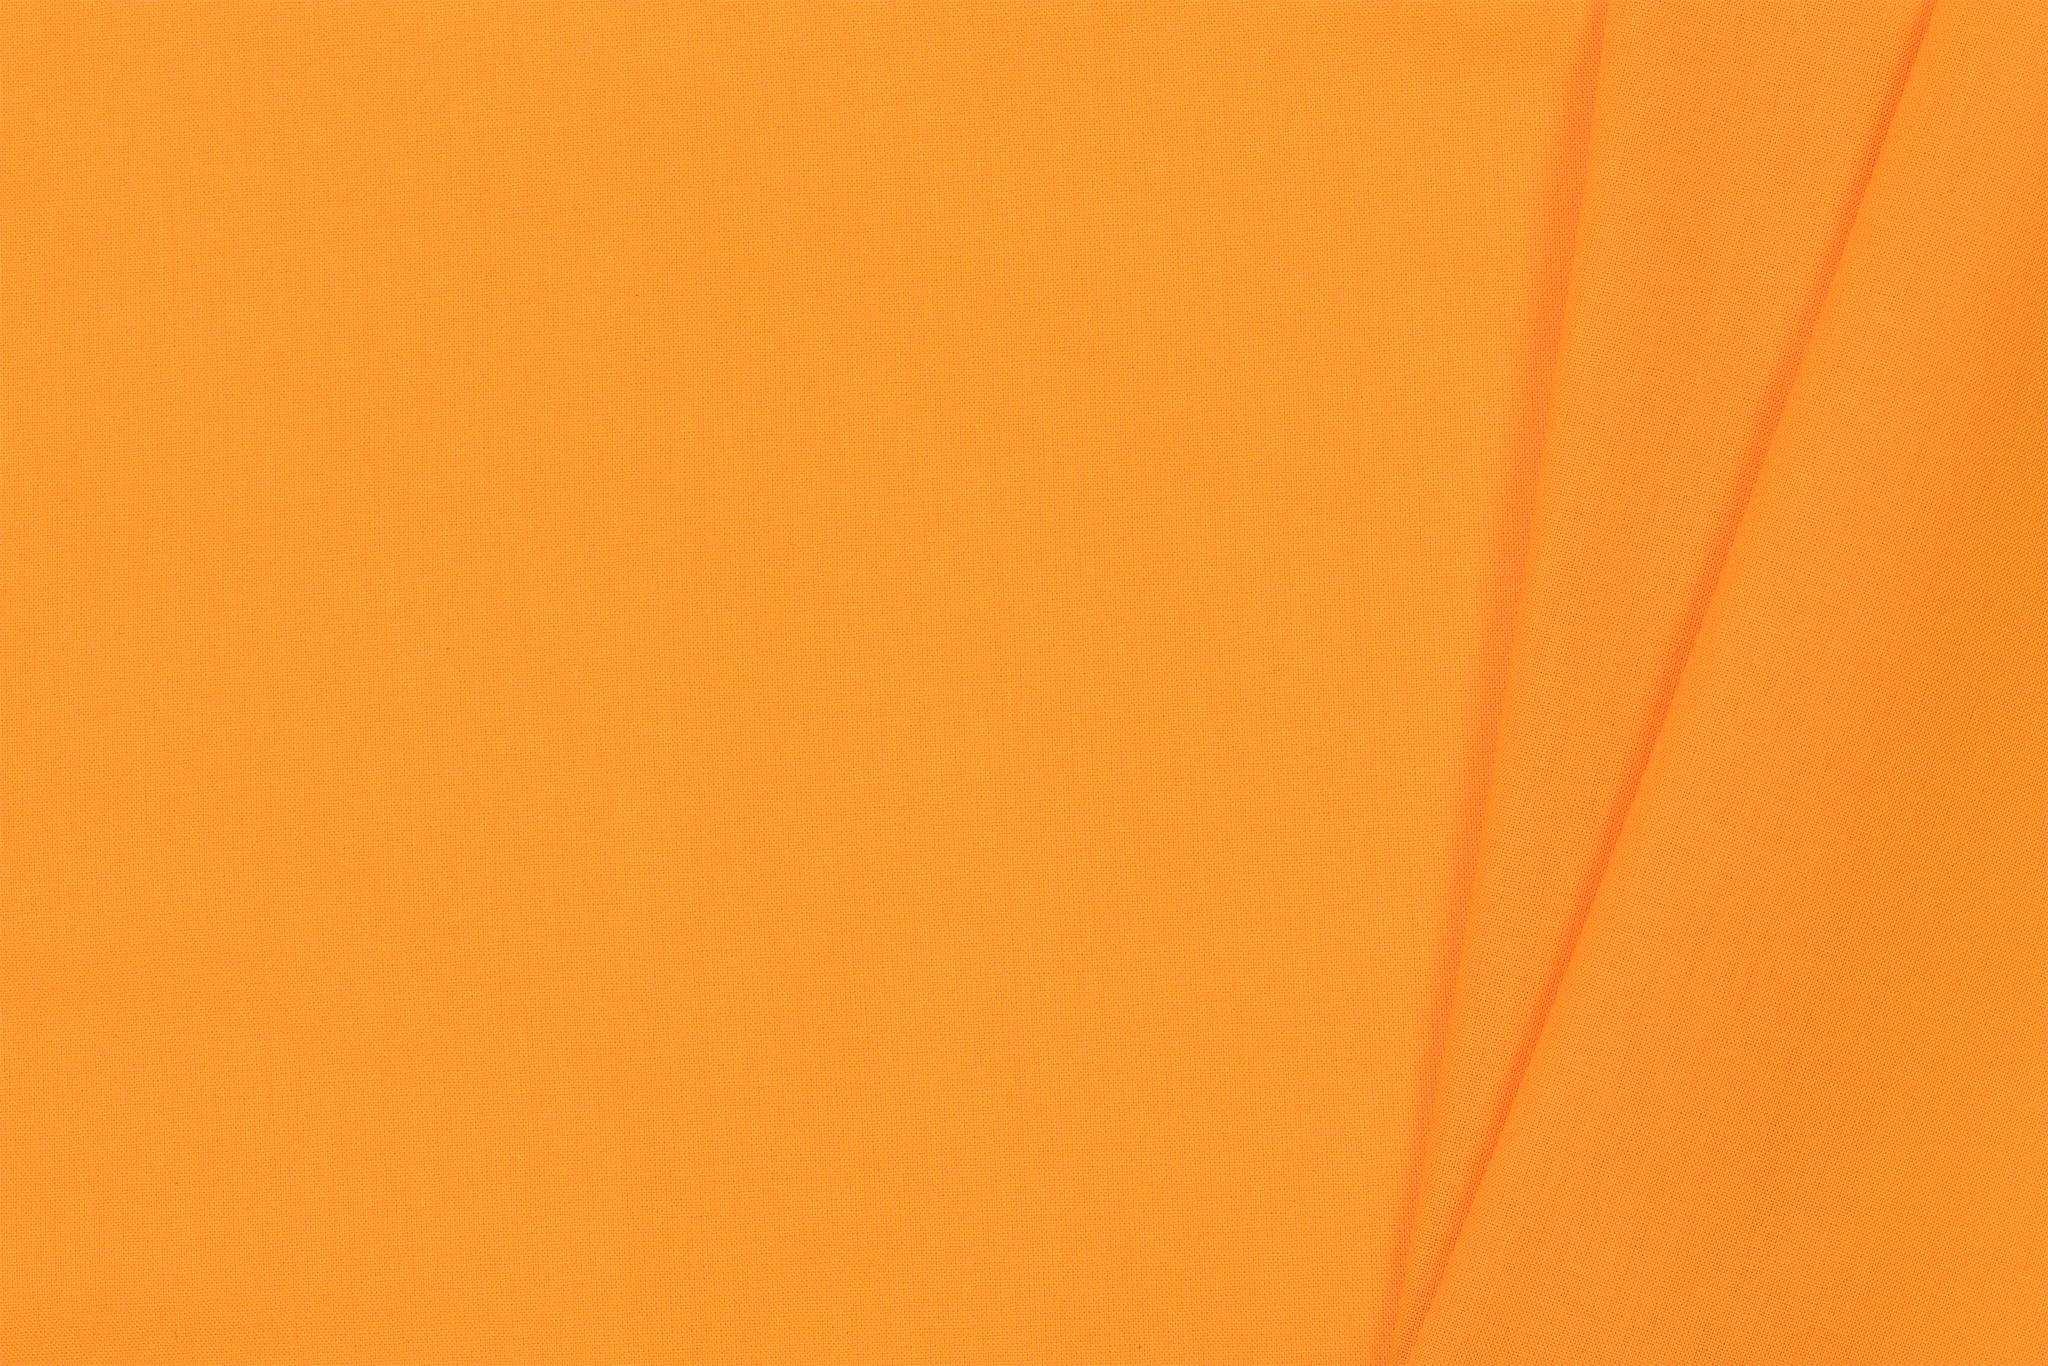 Uni katoen stof, licht oranje